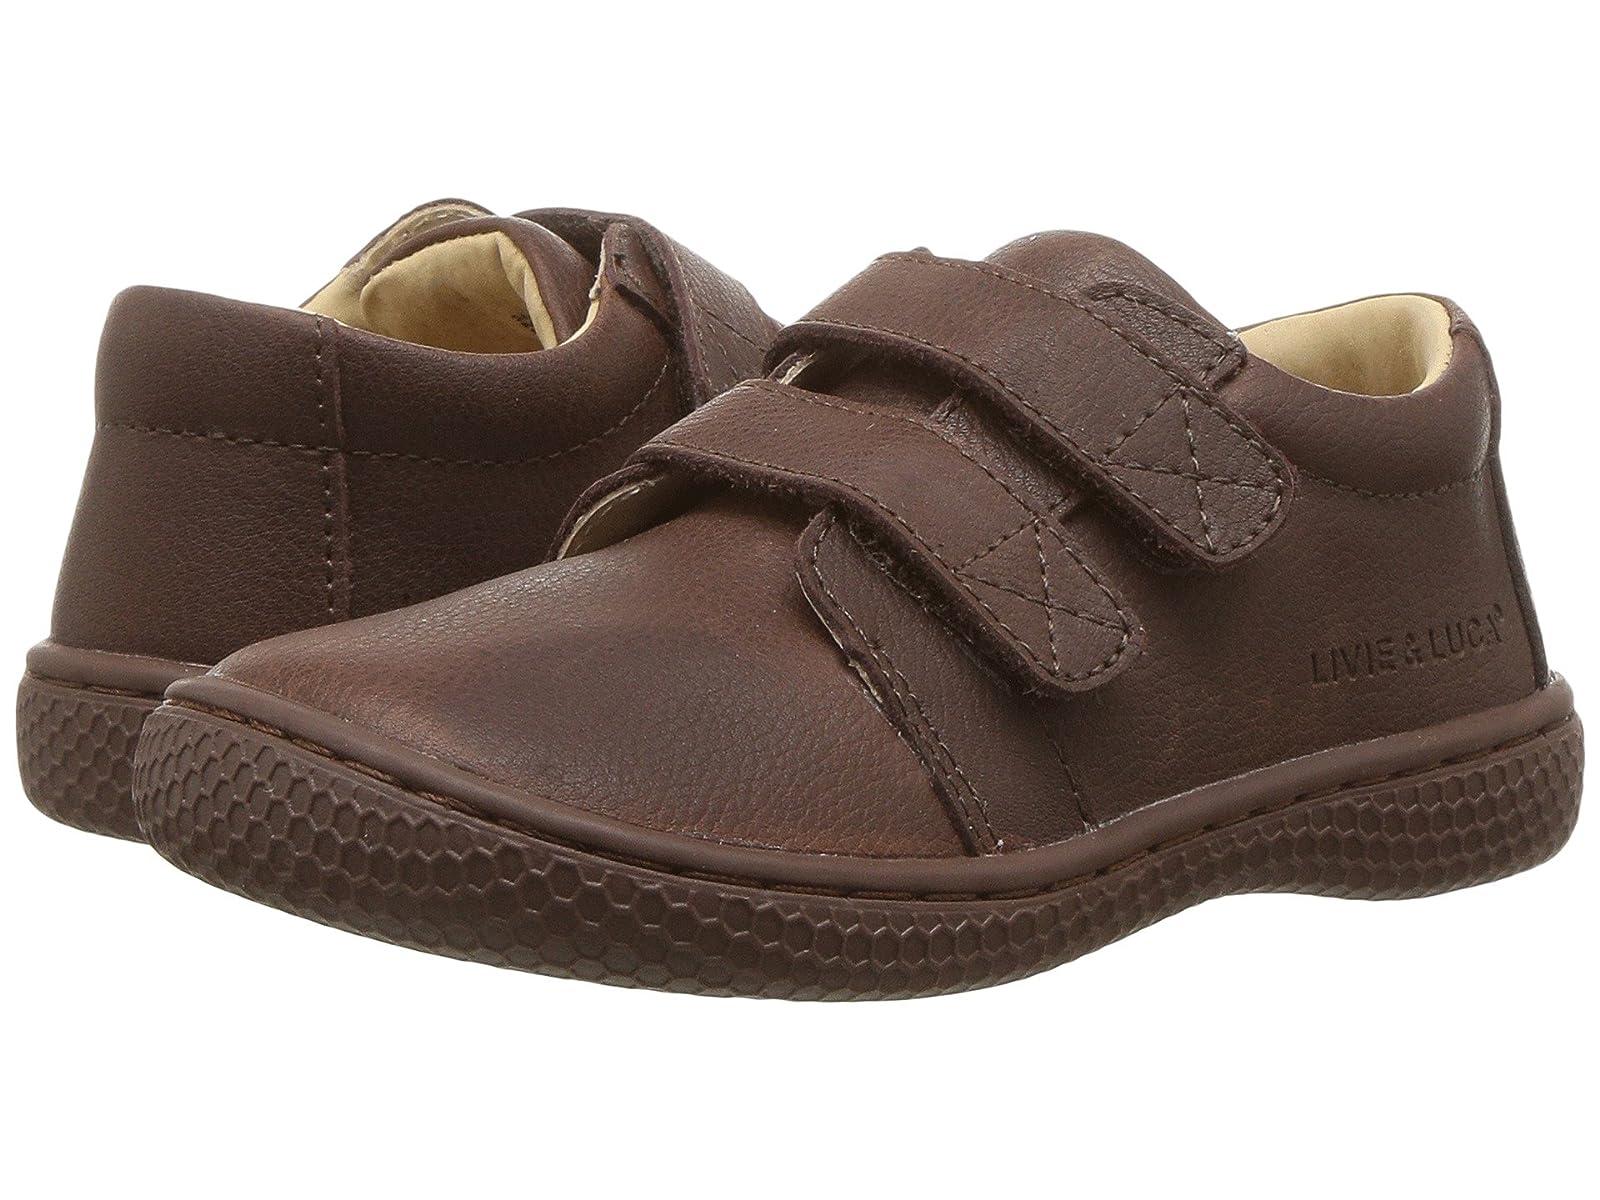 Livie & Luca Hayes (Toddler/Little Kid)Atmospheric grades have affordable shoes